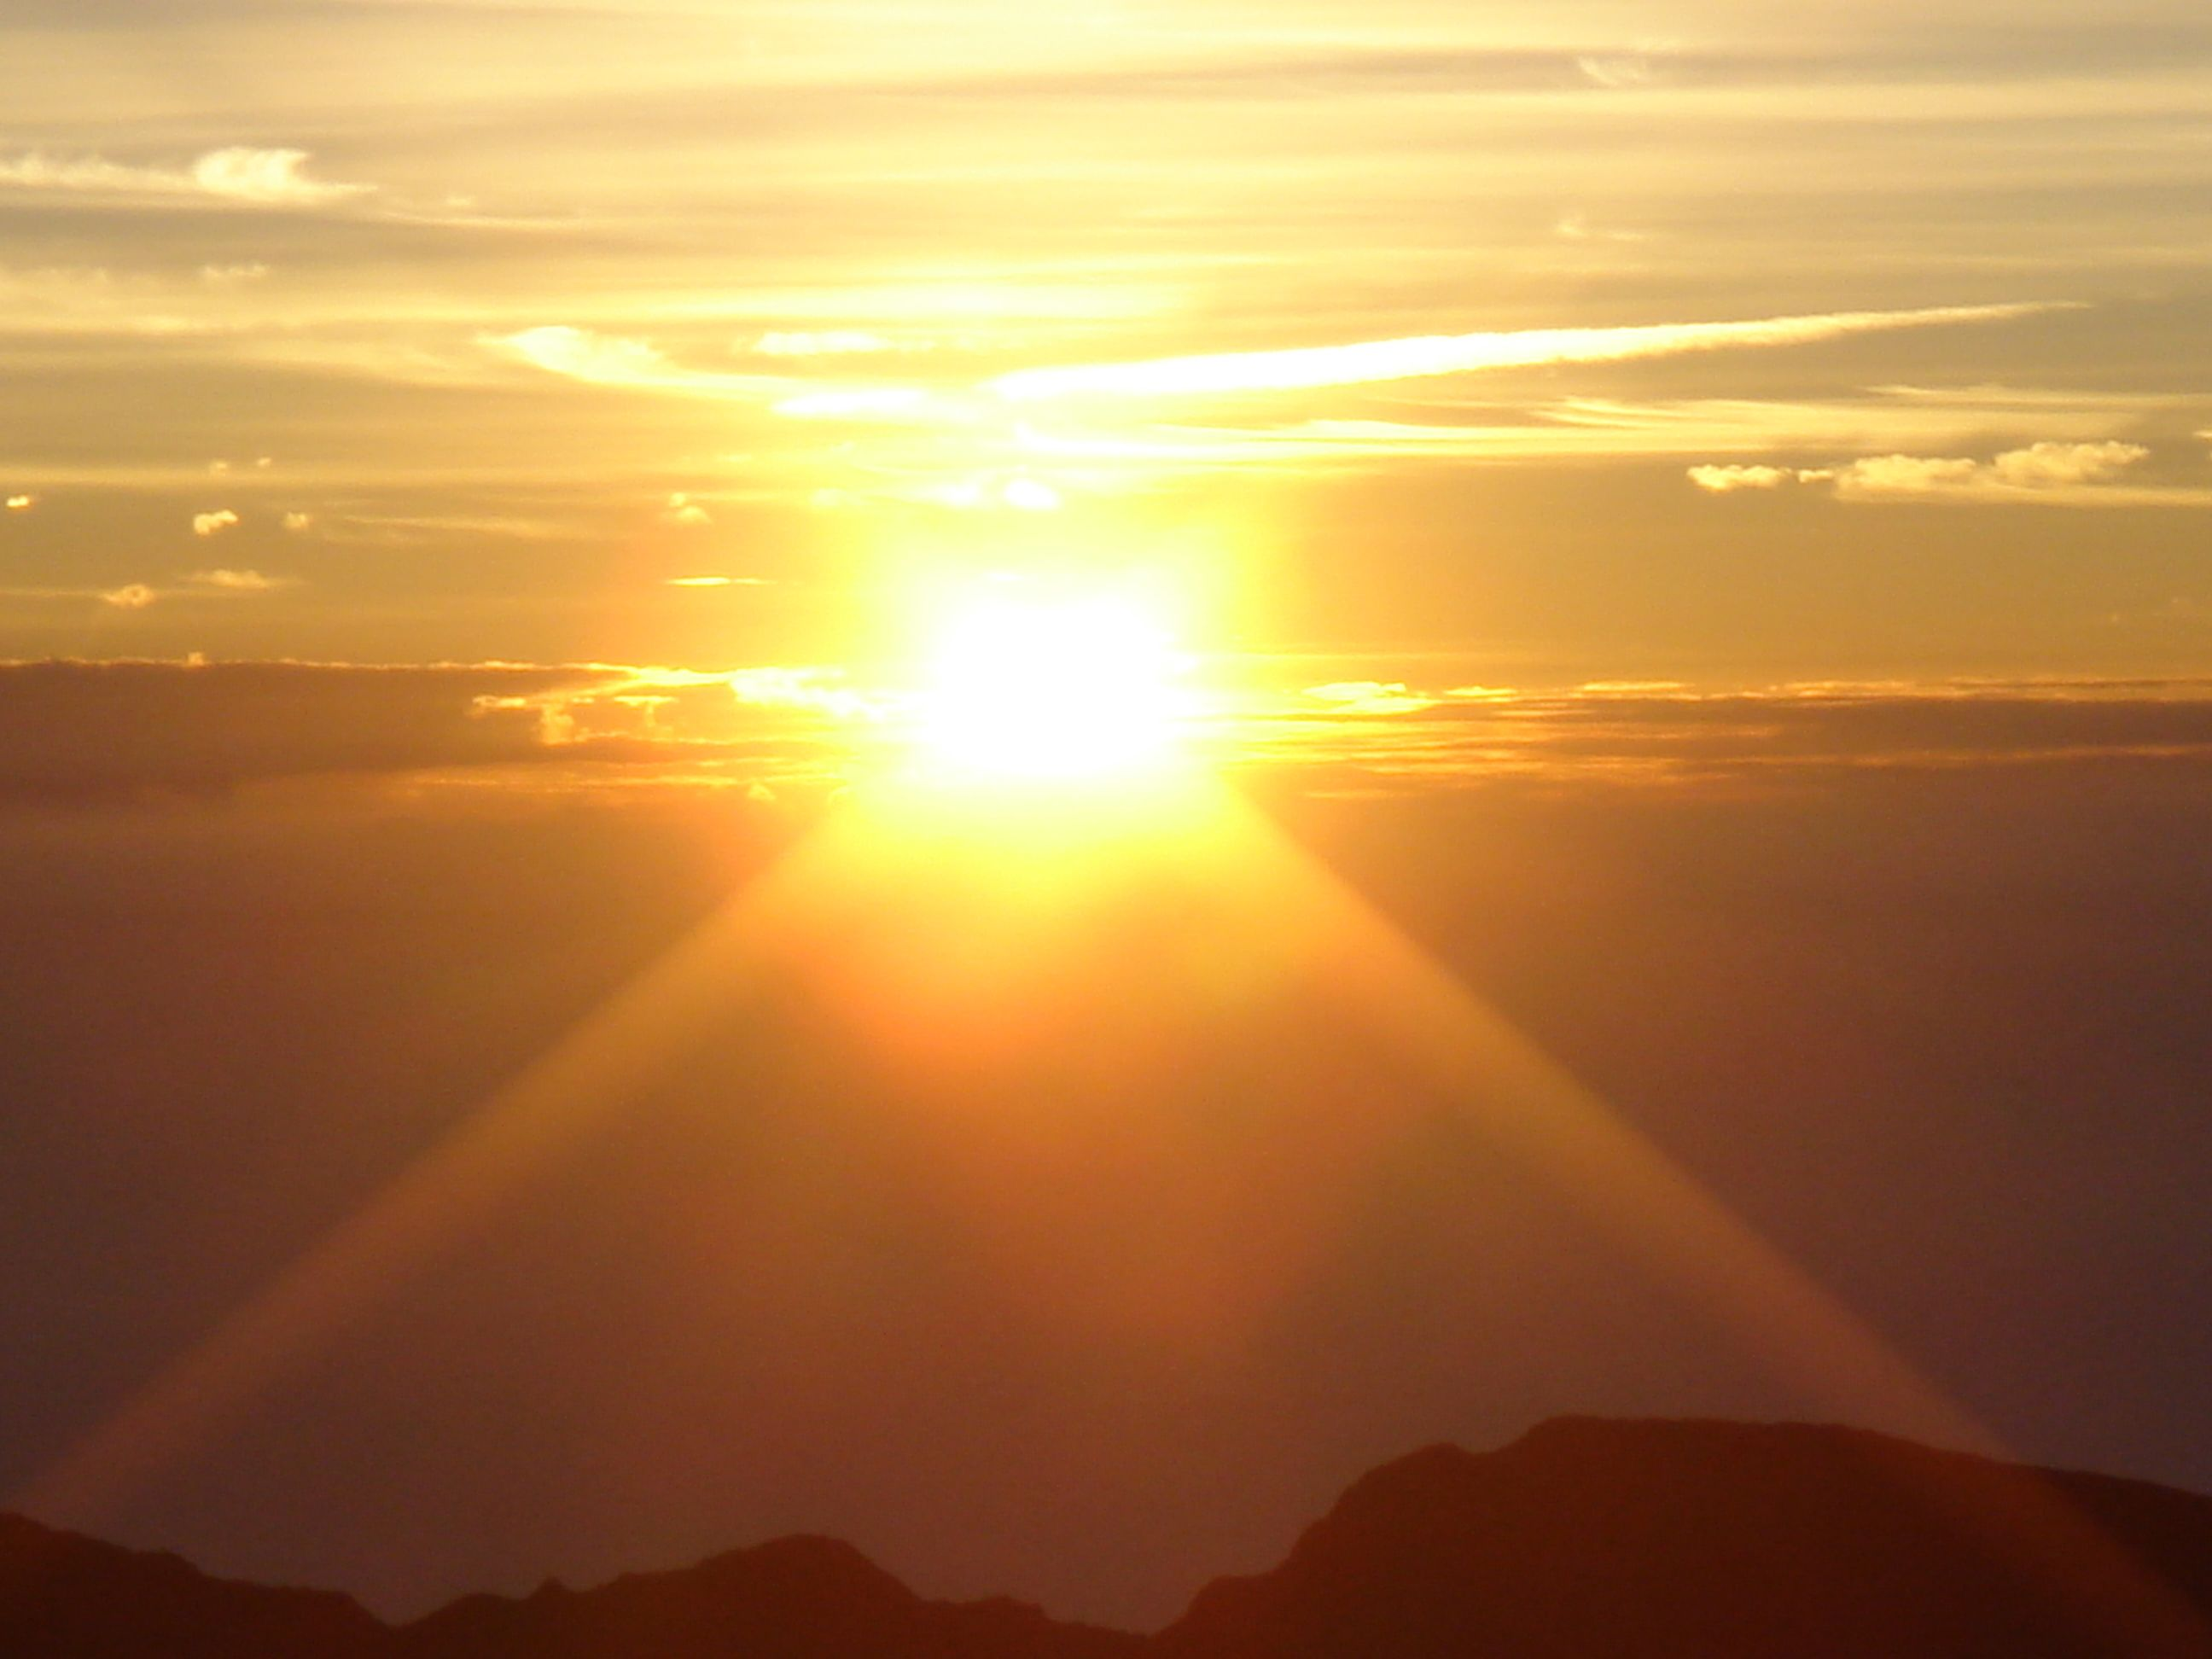 Sunrise in Maui, HI....nothing more peaceful!